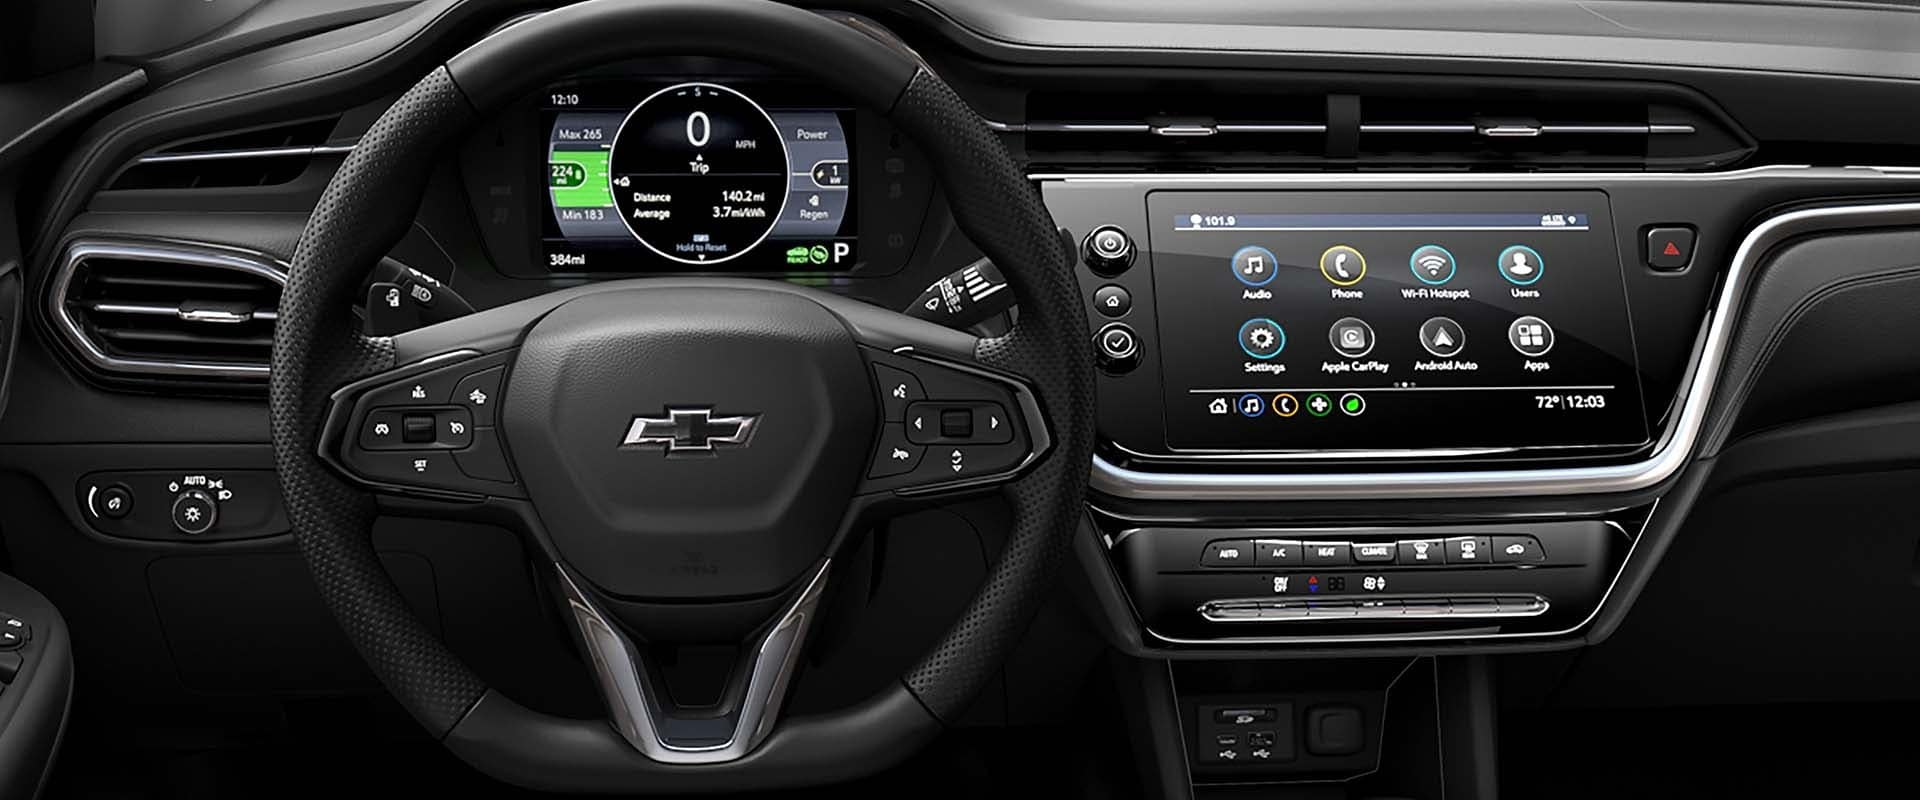 2022 Chevy Bolt EUV interior